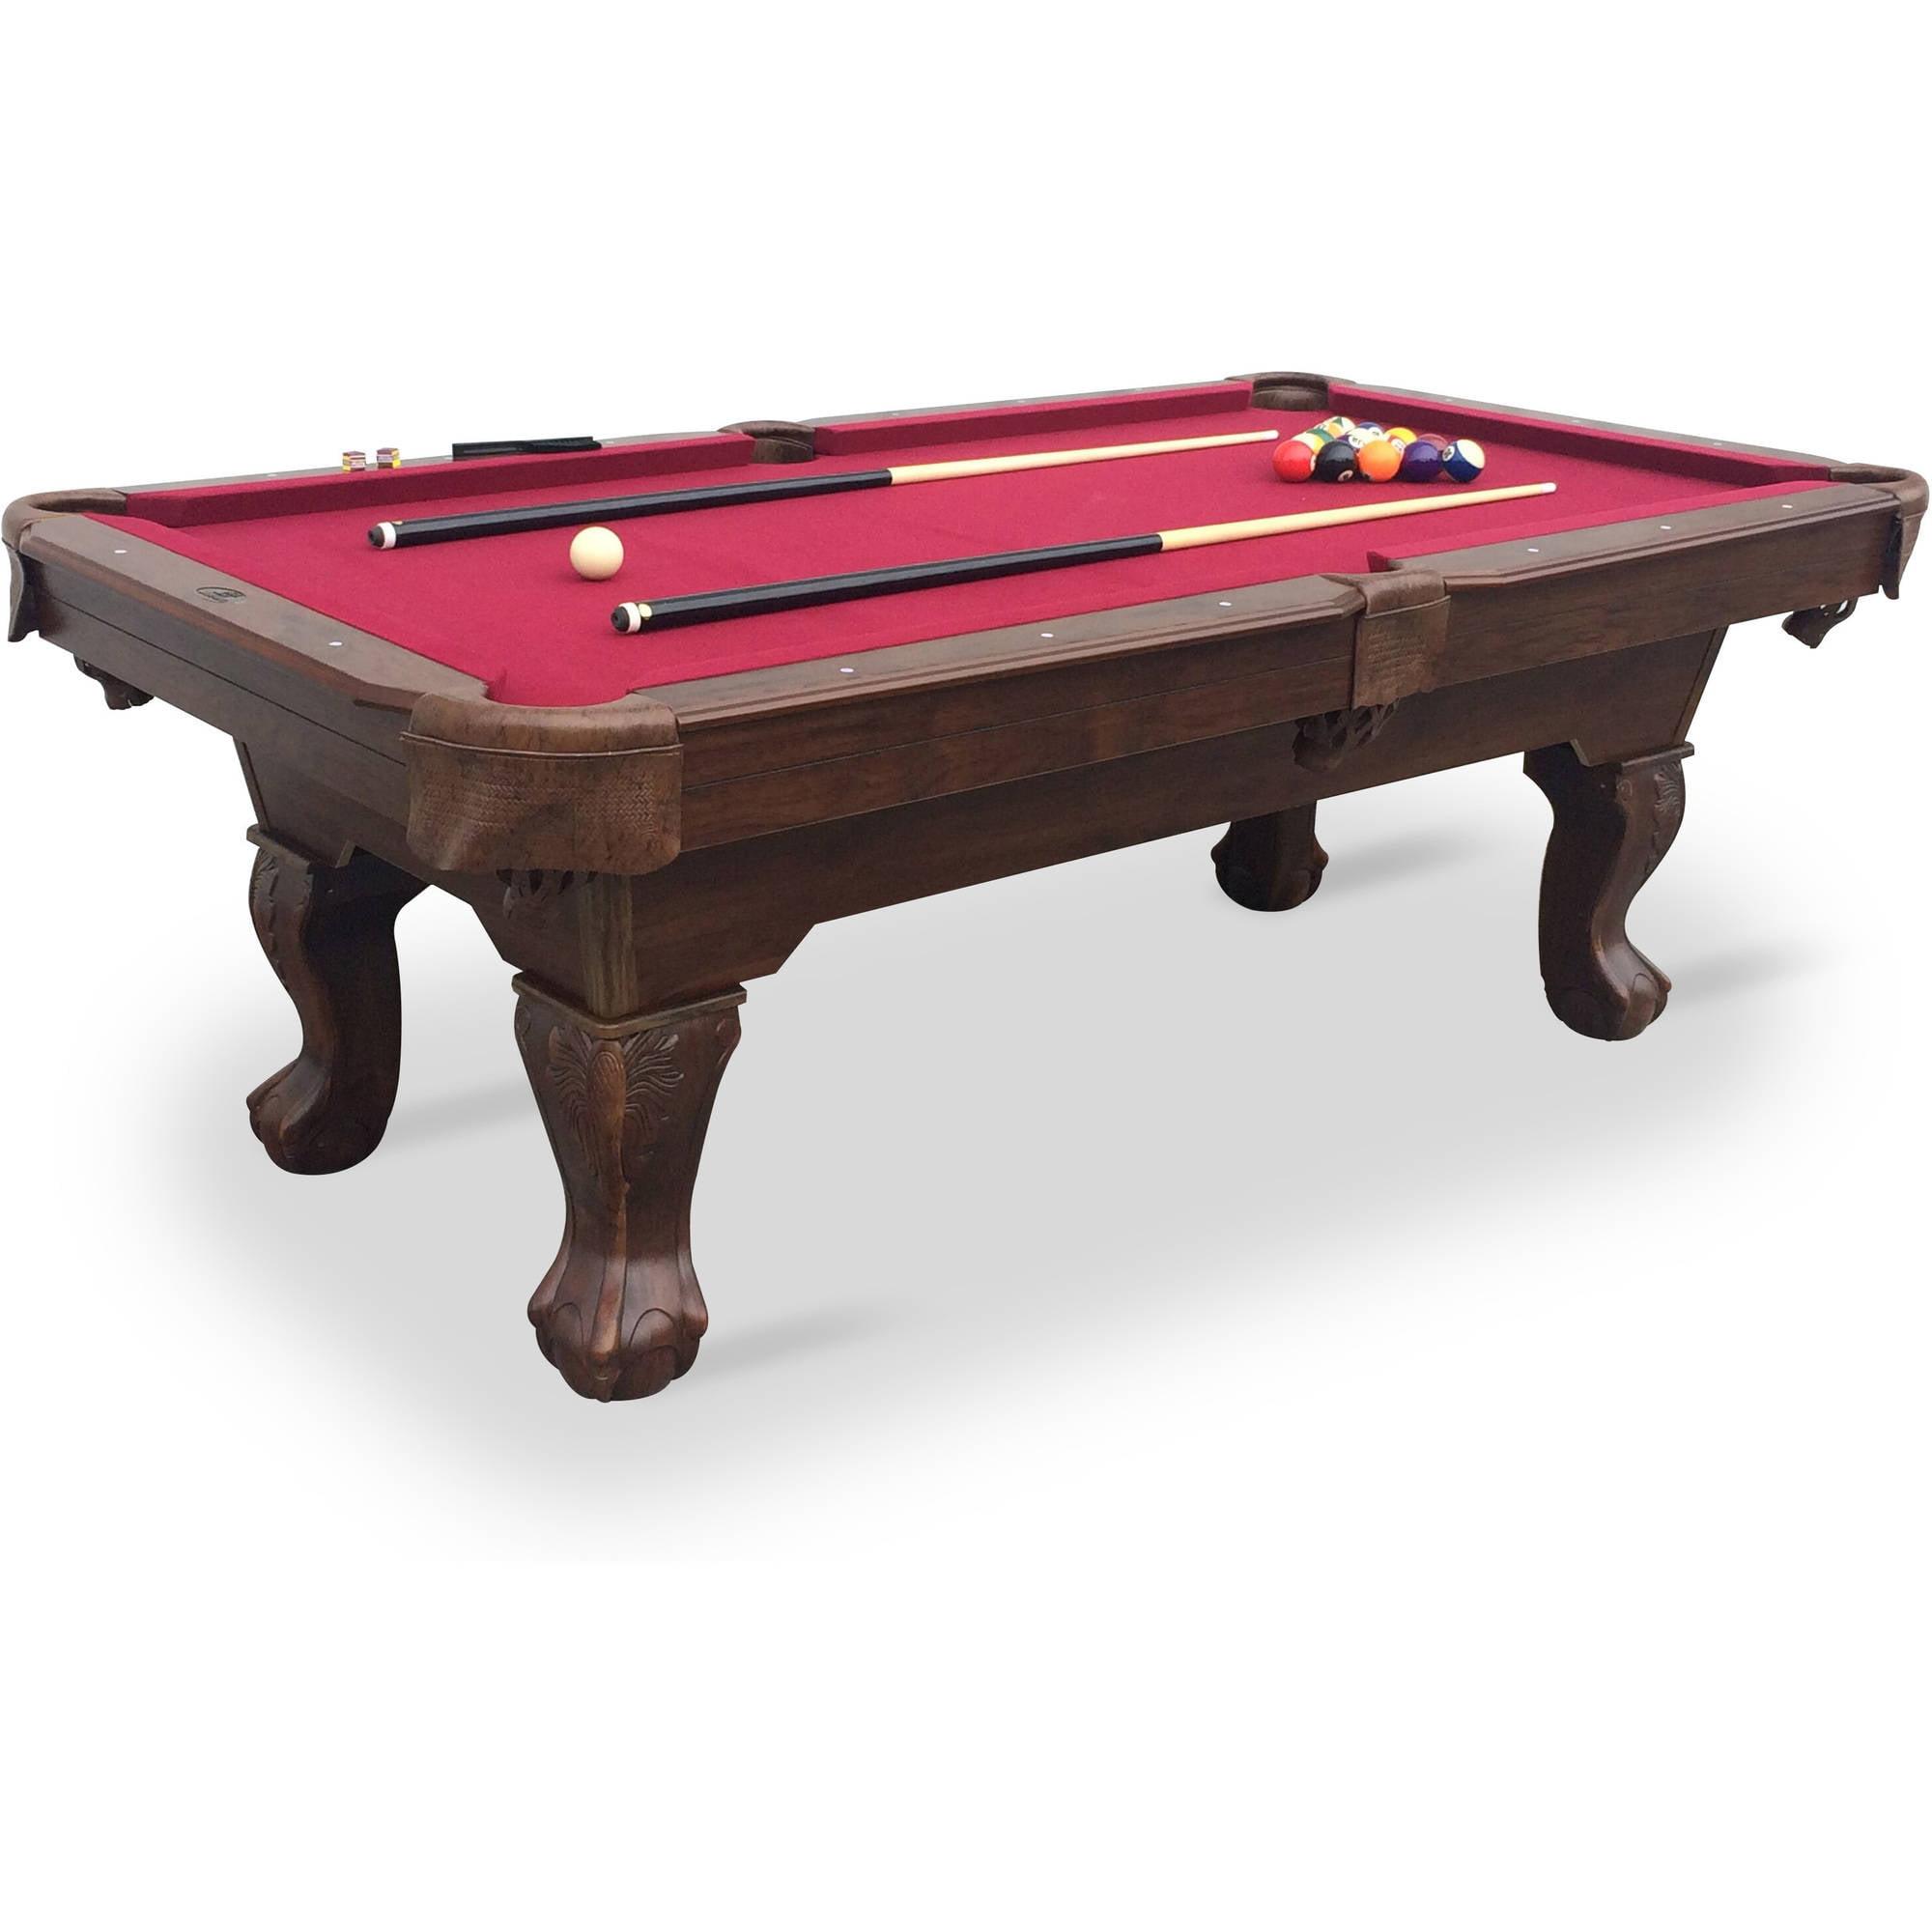 EastPoint Sports Brighton Billiard Pool Table Green Cloth - Pool table equipment near me